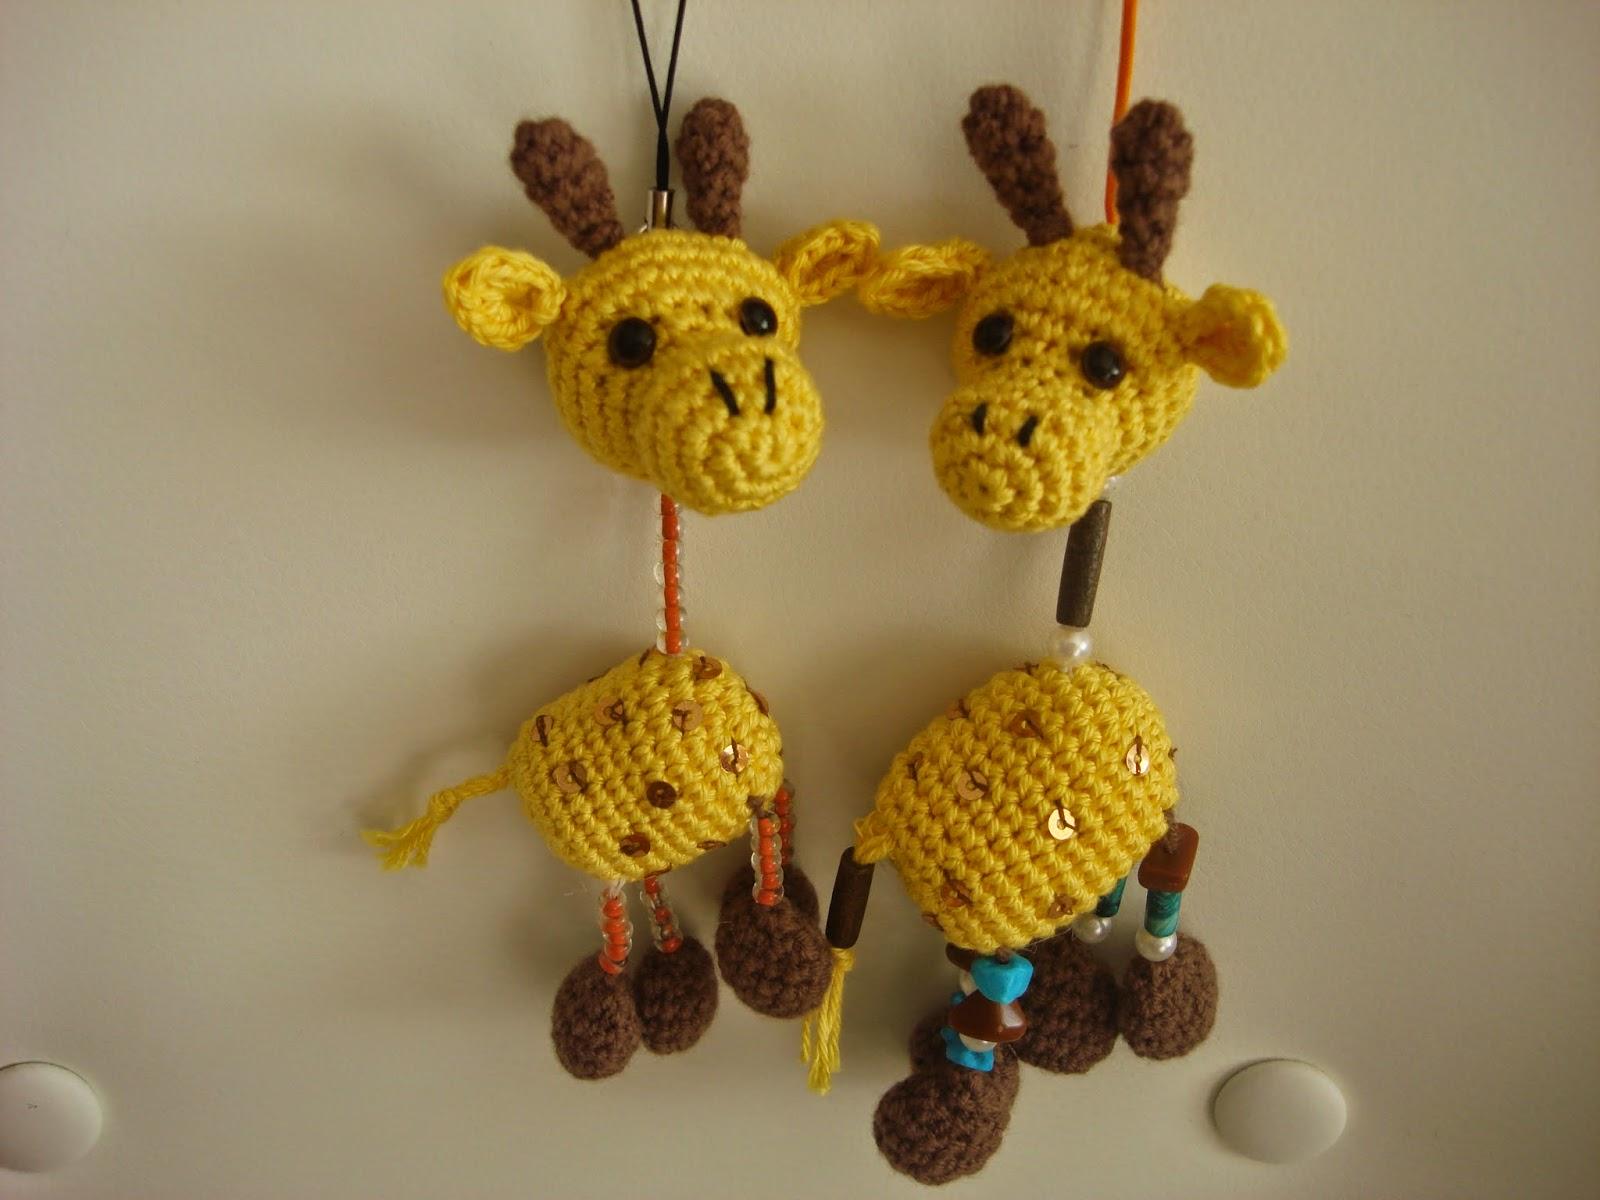 canal crochet llavero jirafa amigurumi patr n libre. Black Bedroom Furniture Sets. Home Design Ideas